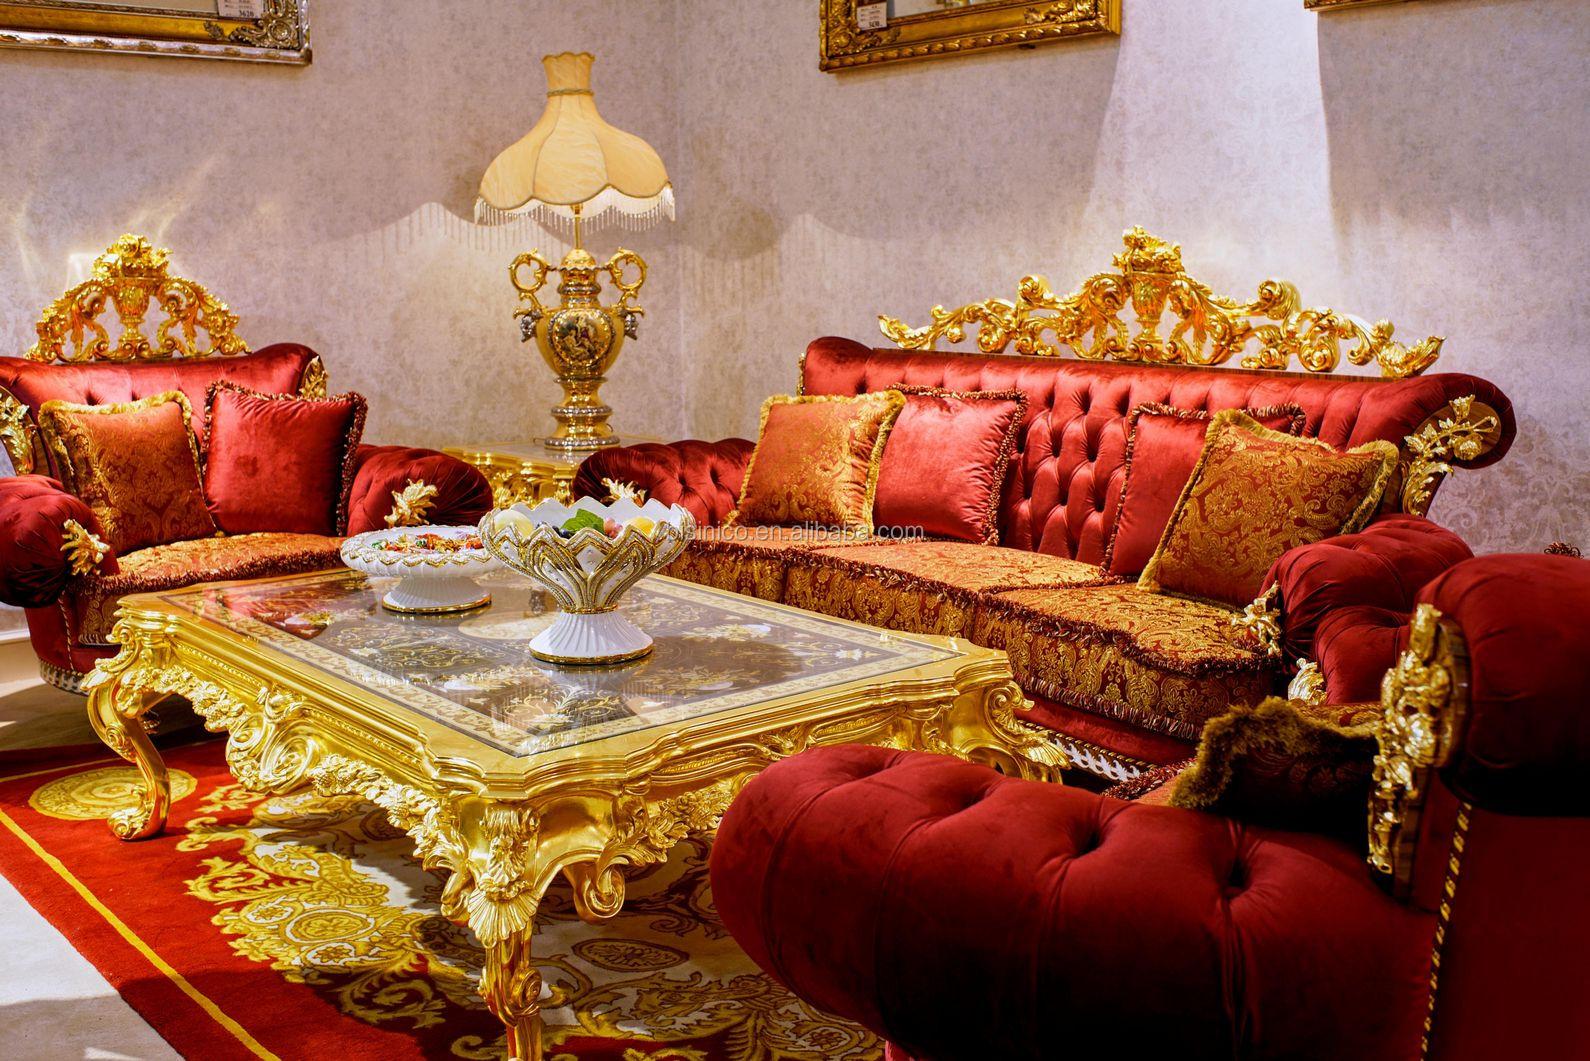 Luxury Antique European Style 24k Gold Button Tufted Red Velvet Sofa Set/  Flower Design Wood Carved Living Room Furniture - Buy Luxury Antique 24k ...